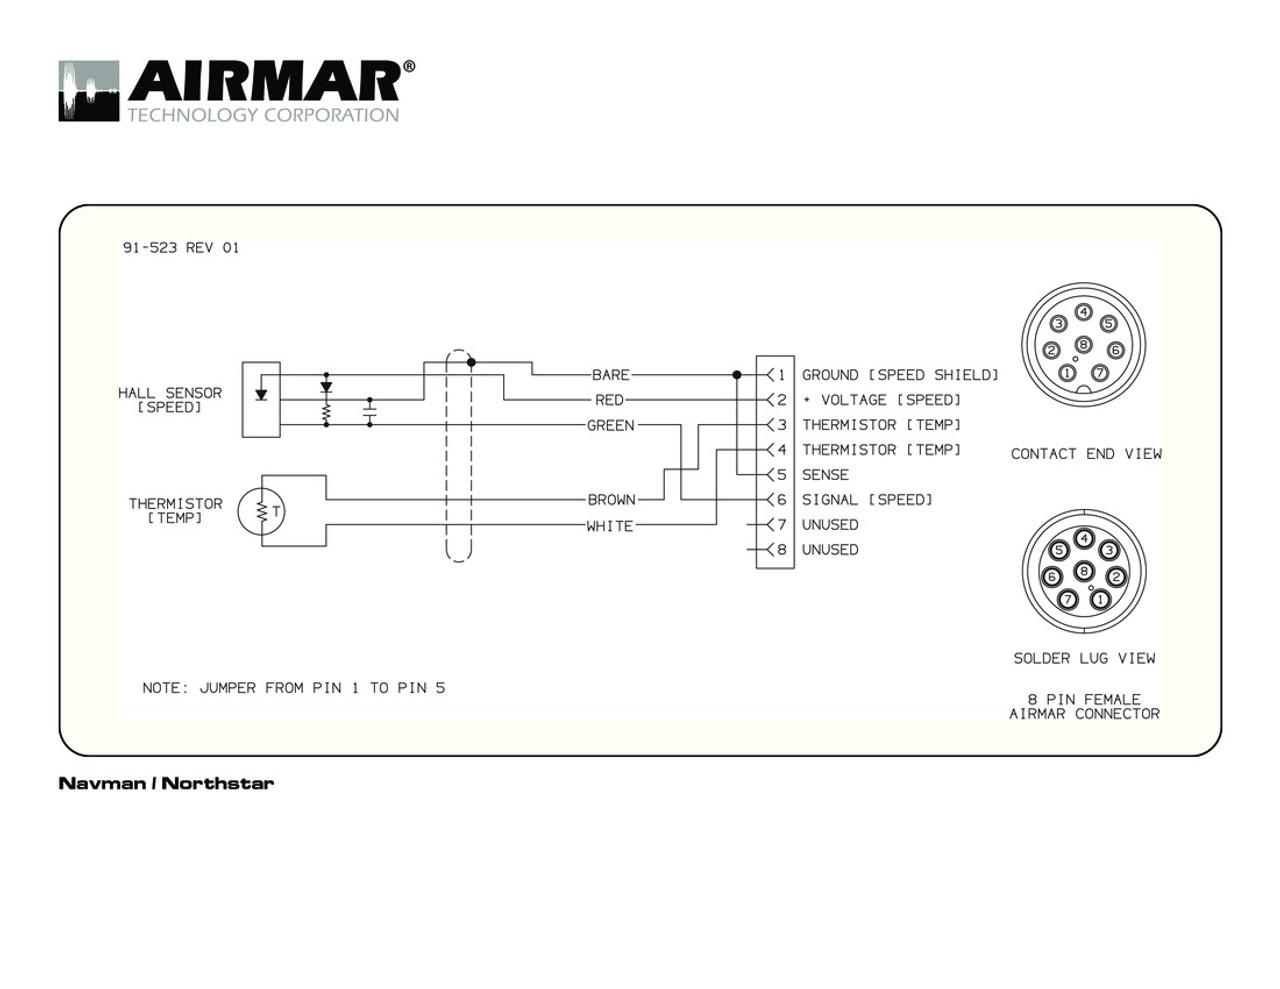 small resolution of airmar wiring diagram navman northstar blue bottle marine mercruiser smartcraft wiring diagram northstar wiring diagram